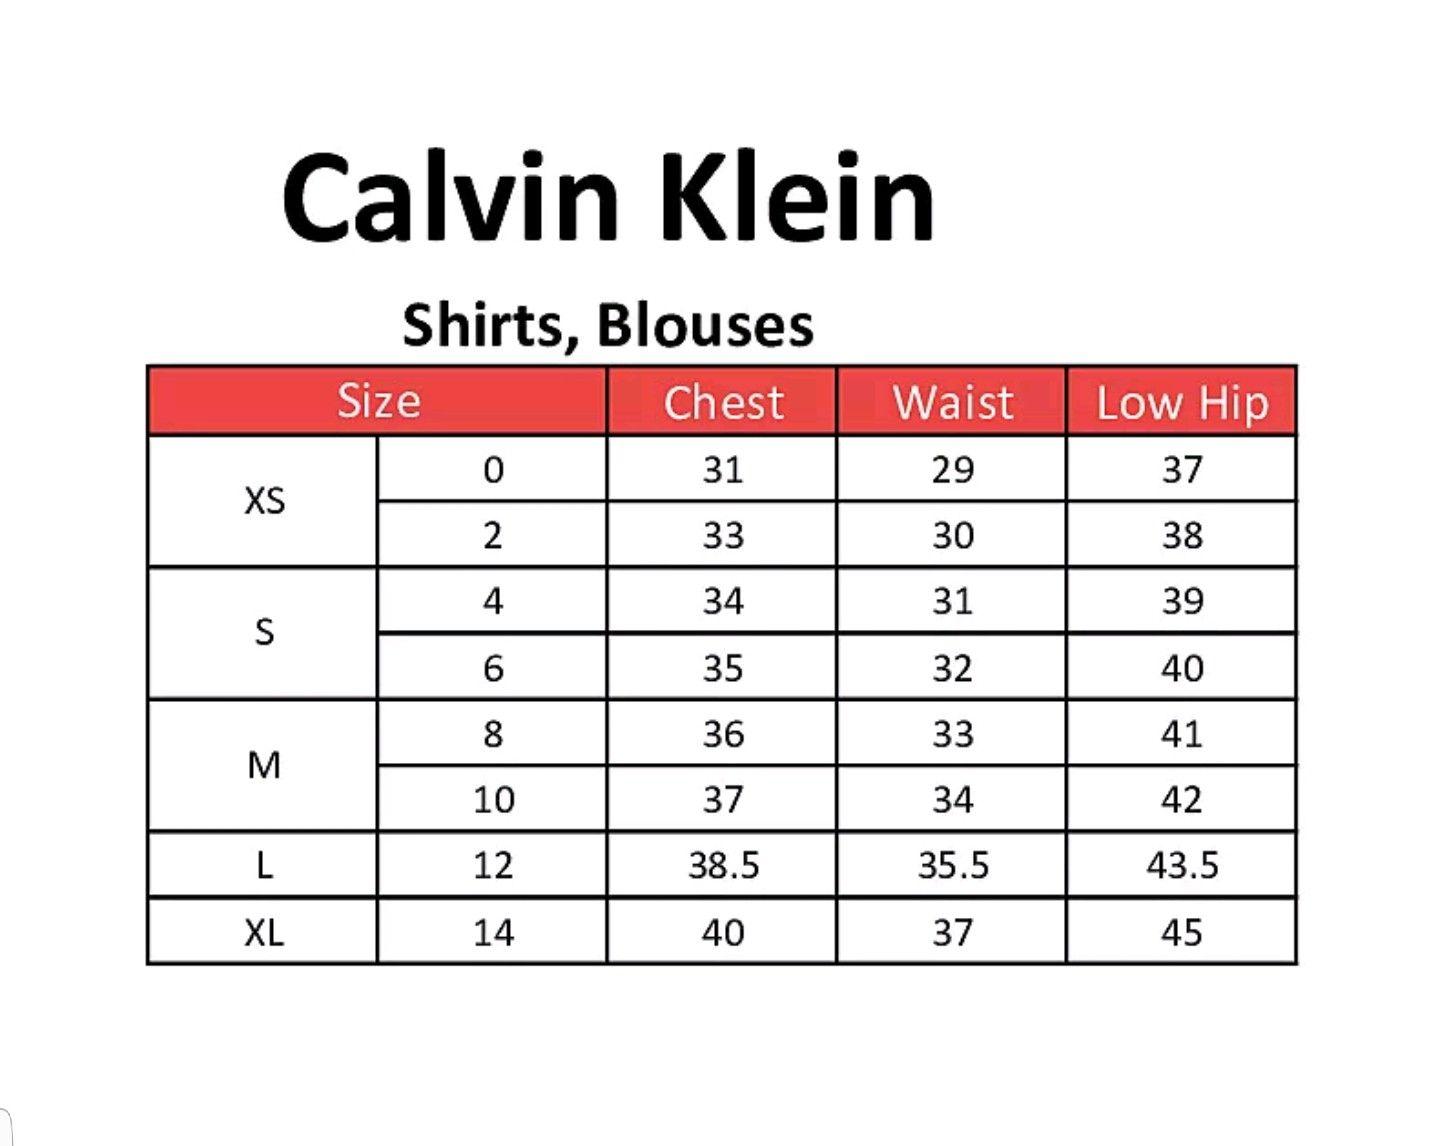 Calvin Klein Name Brand Clothing Size Charts Calvin Klein